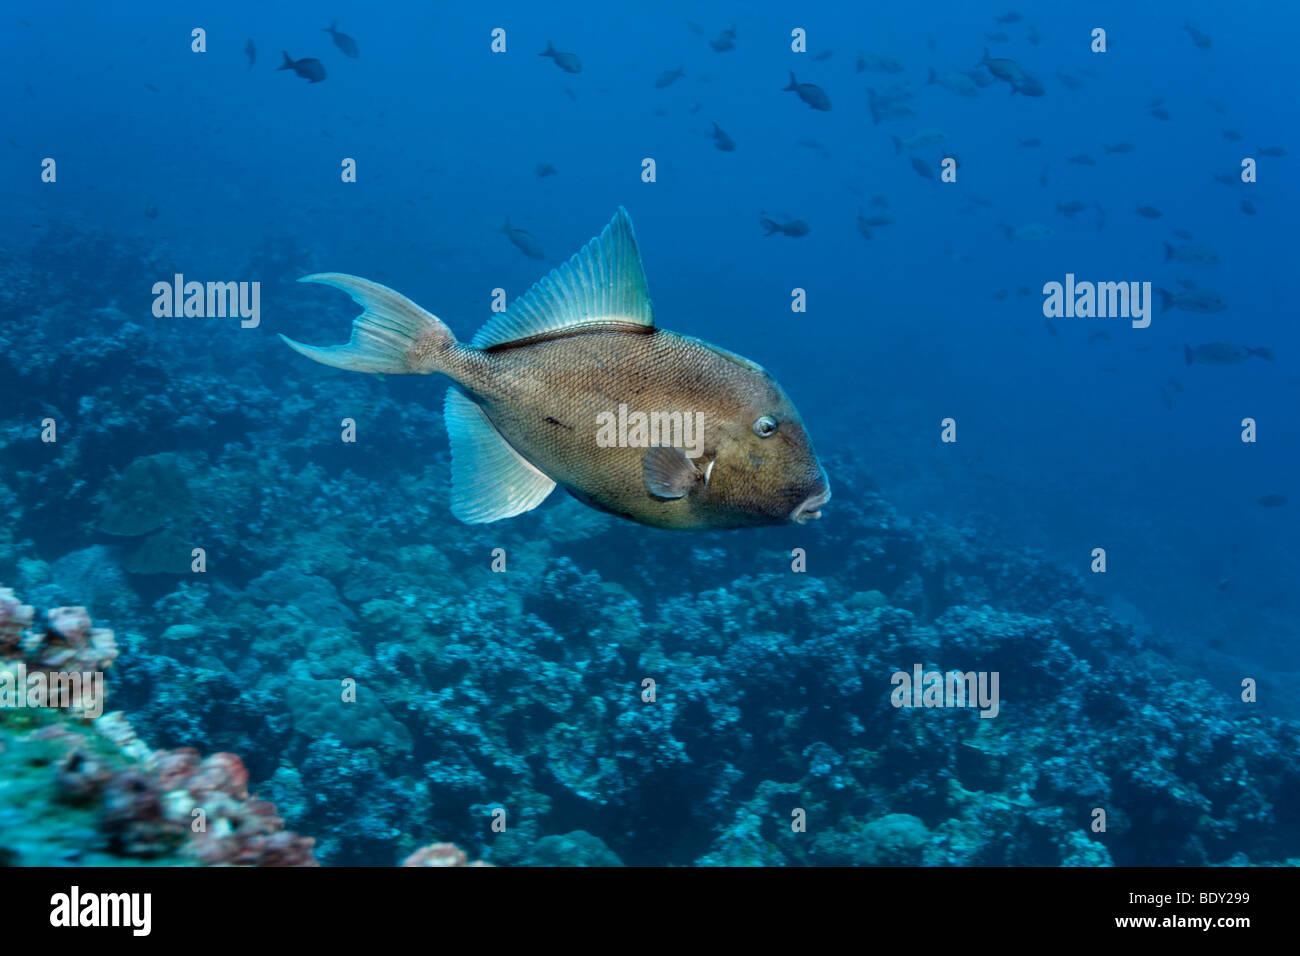 Östlichen Pazifik Drückerfisch (Balistes Polylepis), Darwin Insel, Galapagos-Archipel, UNESCO-Weltkulturerbe, Stockbild